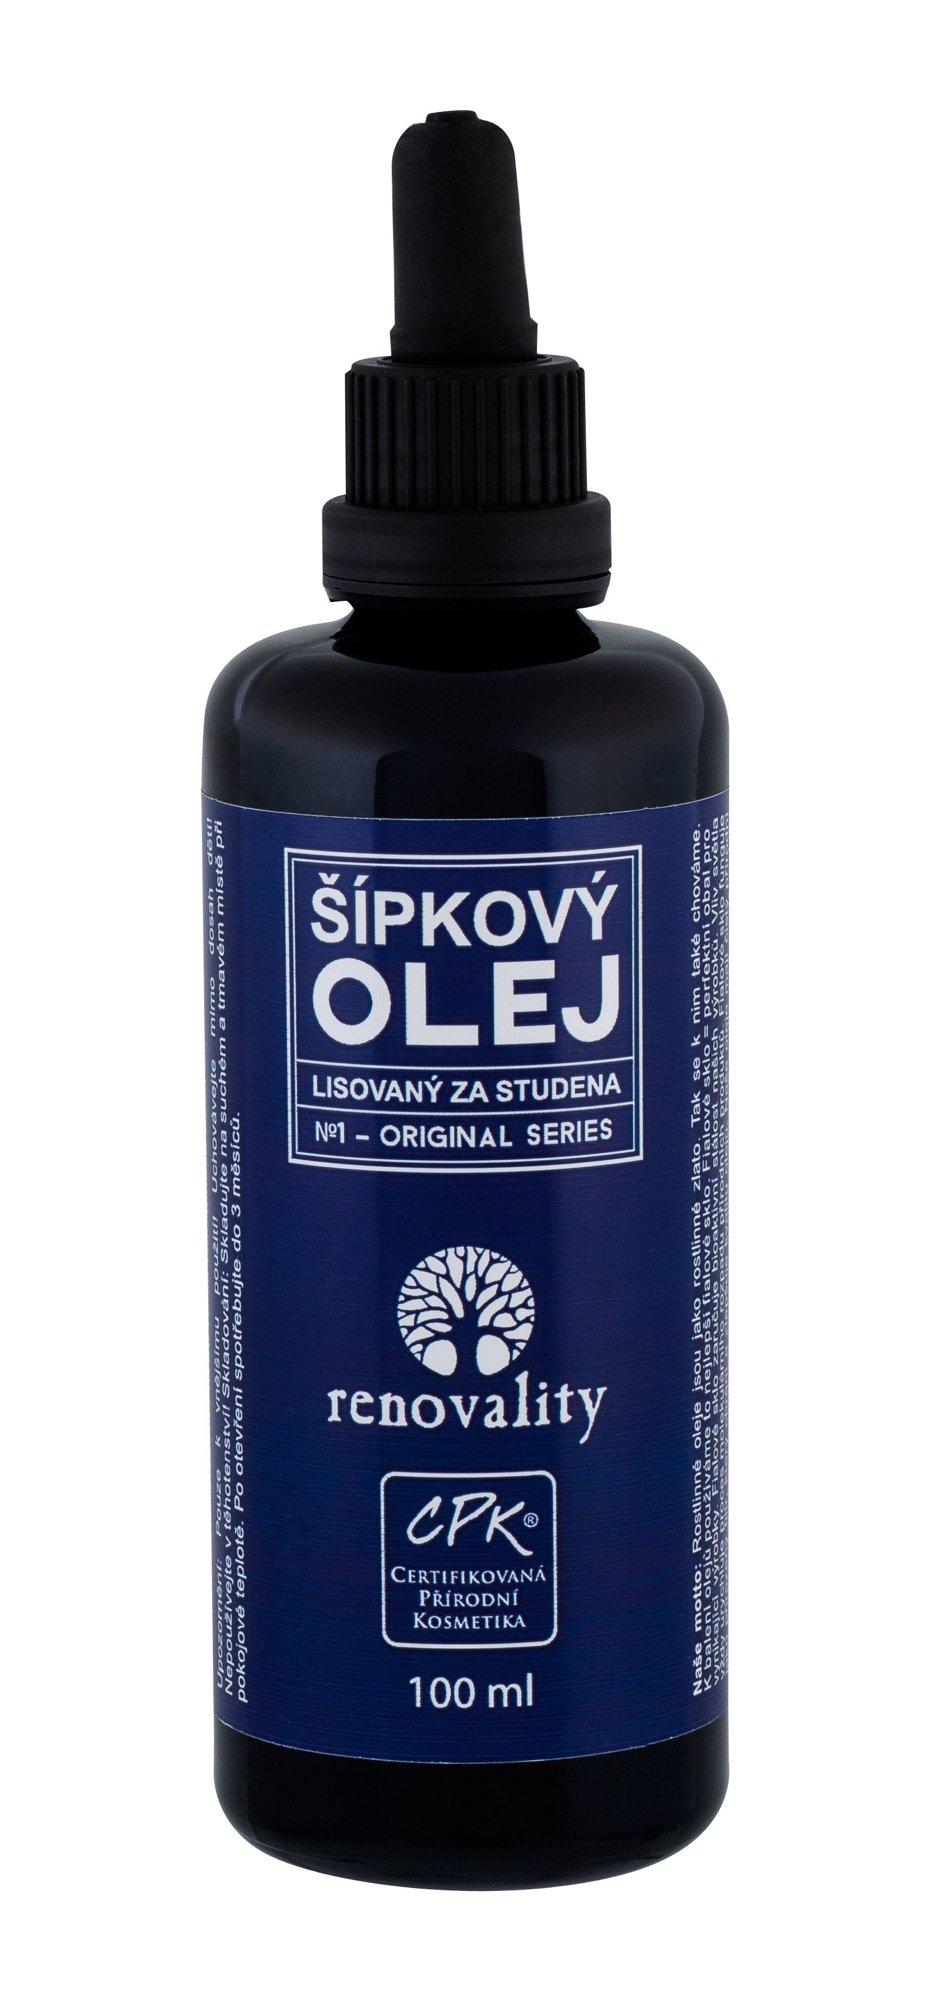 Renovality Original Series Body Oil 100ml  Rosehip Oil